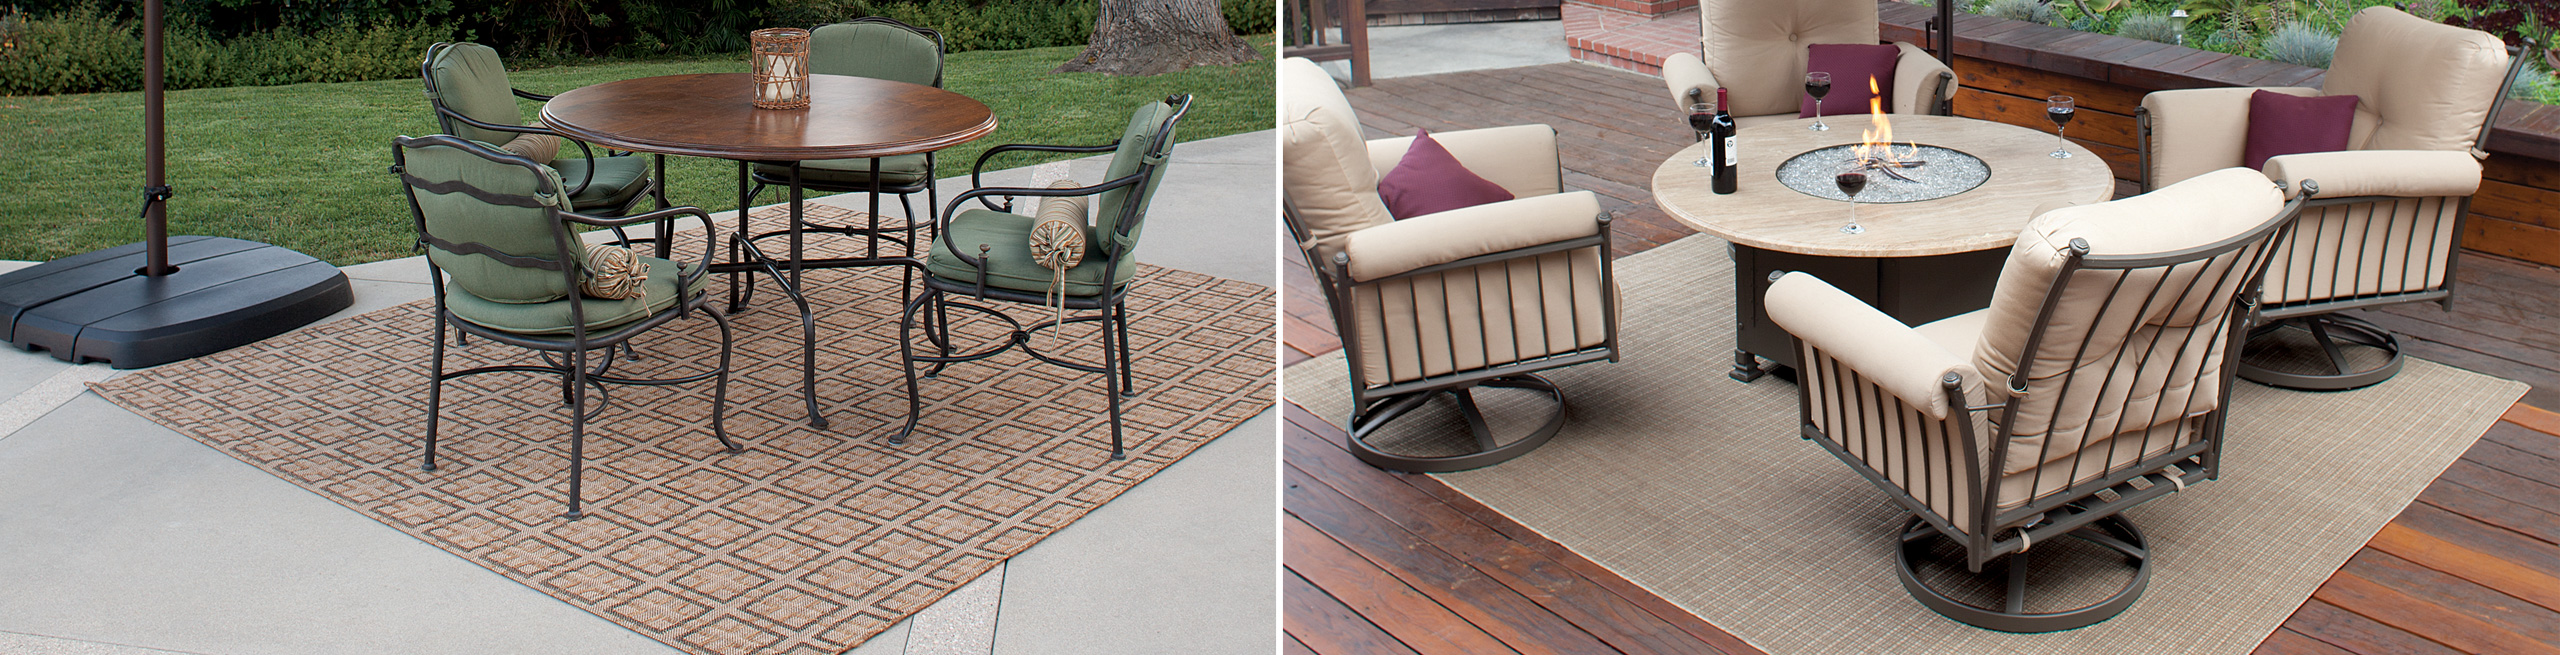 patio rug outdoor rugs FJVEPMW